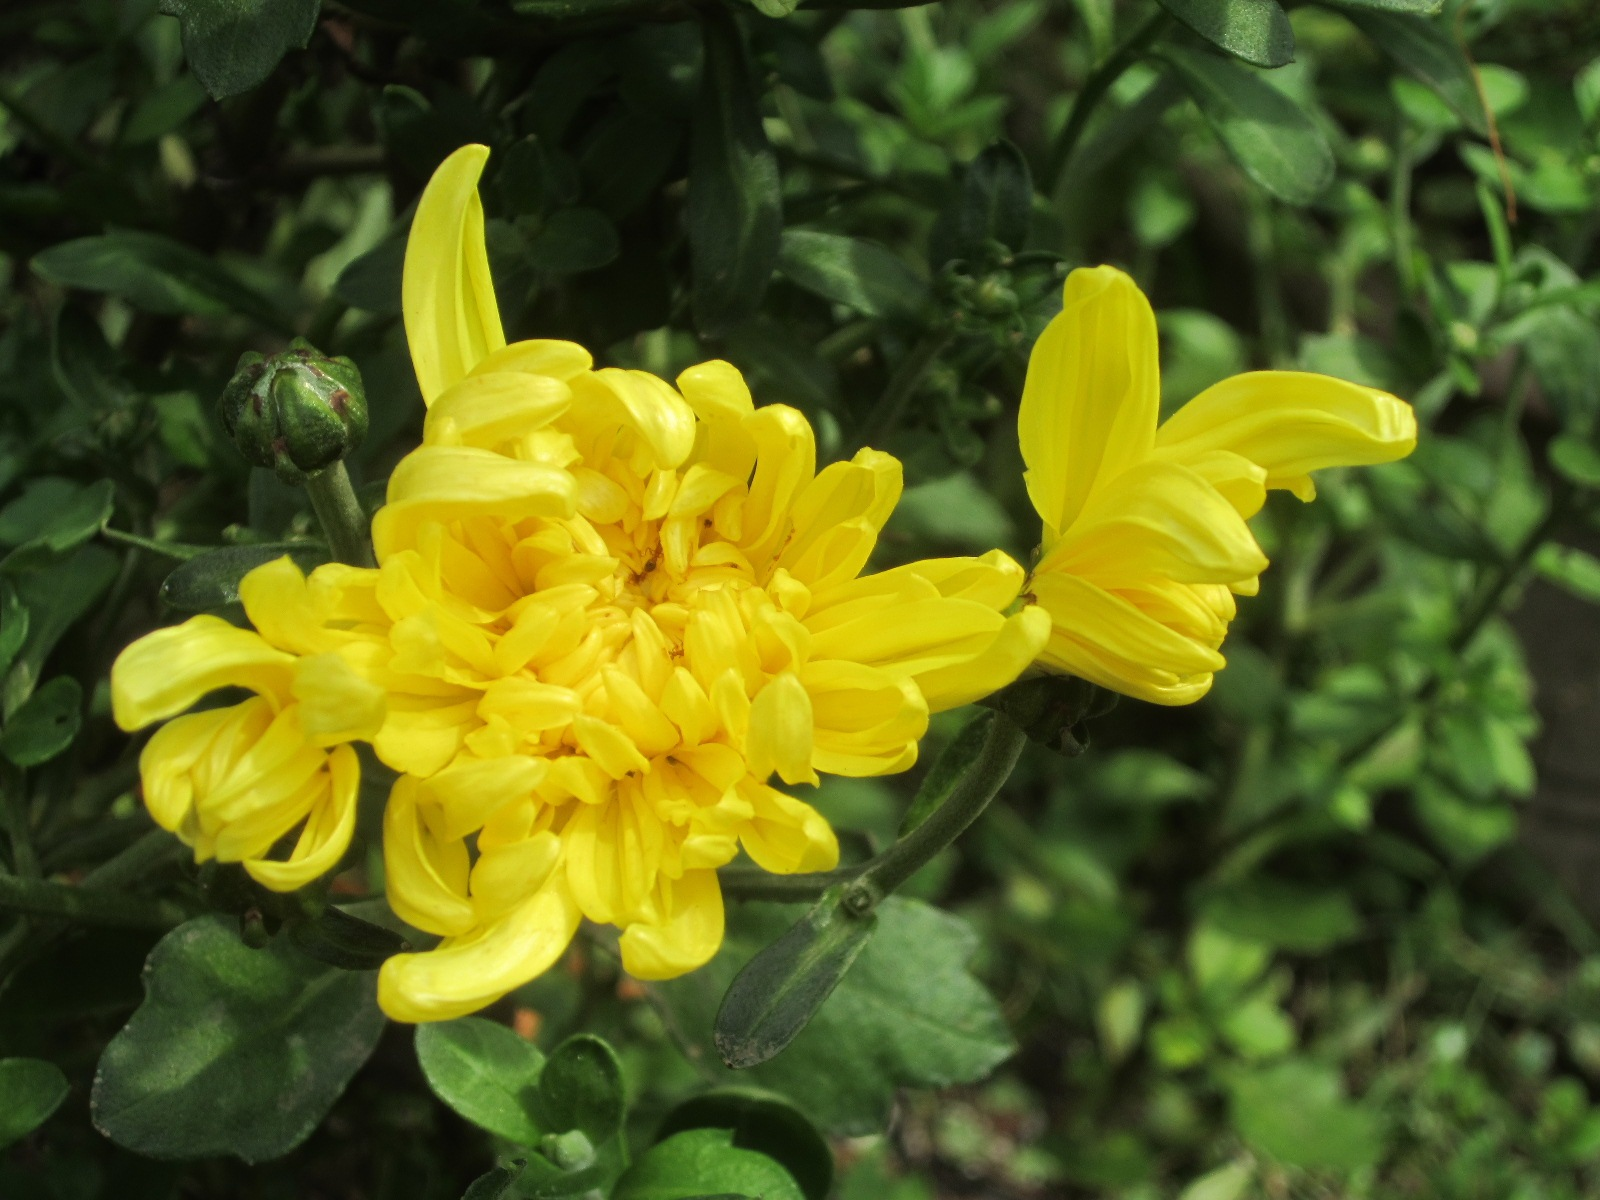 Chrysanthemum flower  by amie